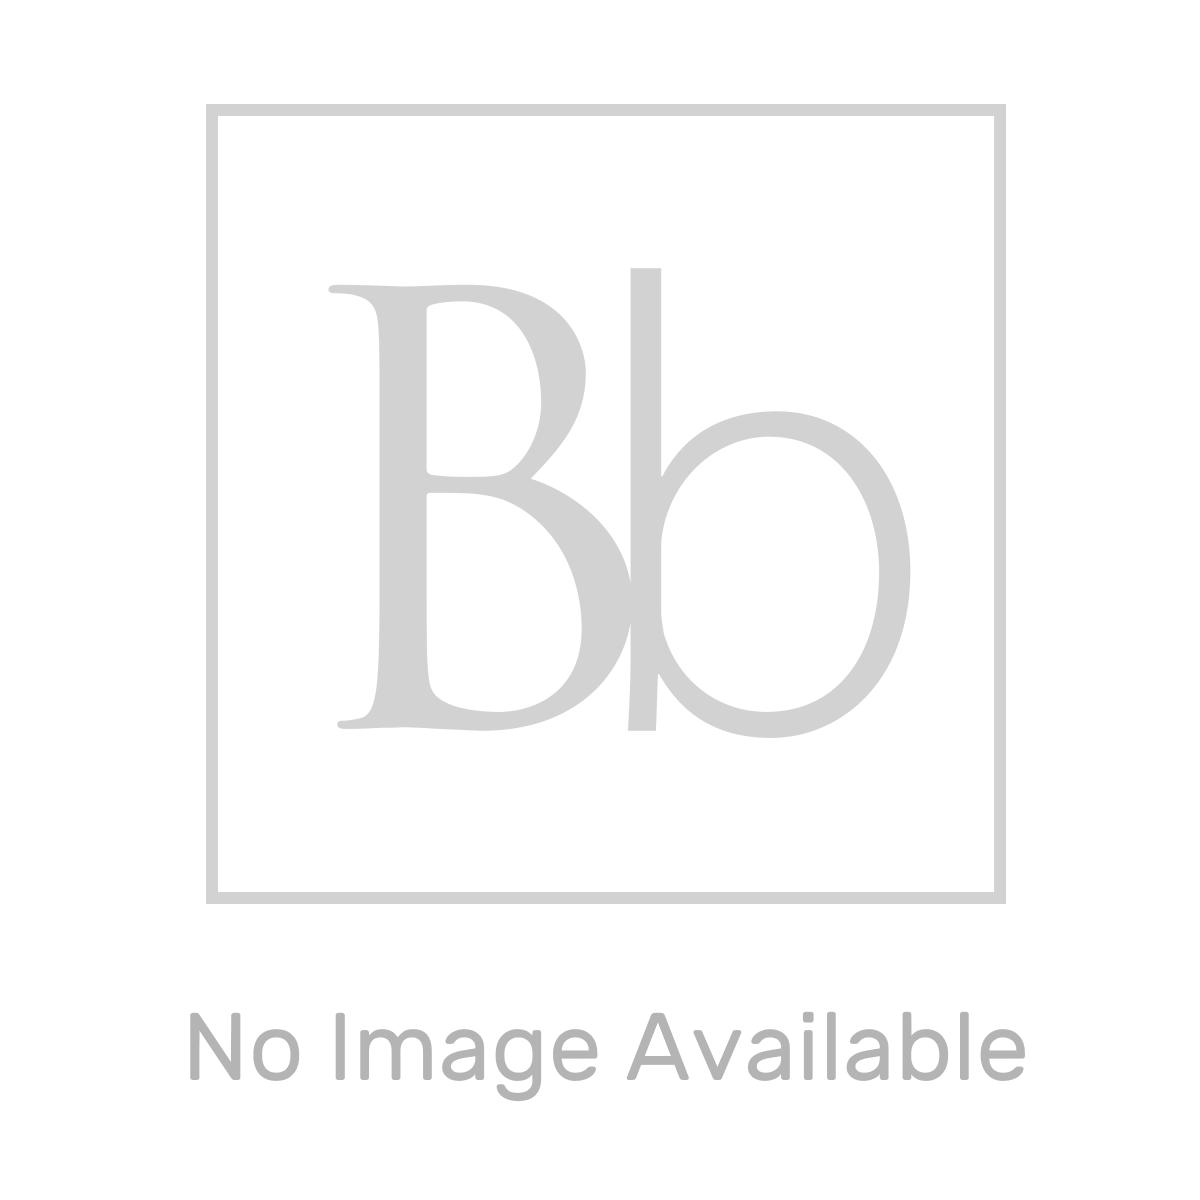 Aquadart Turbo Shower Waste 90mm Dimensions